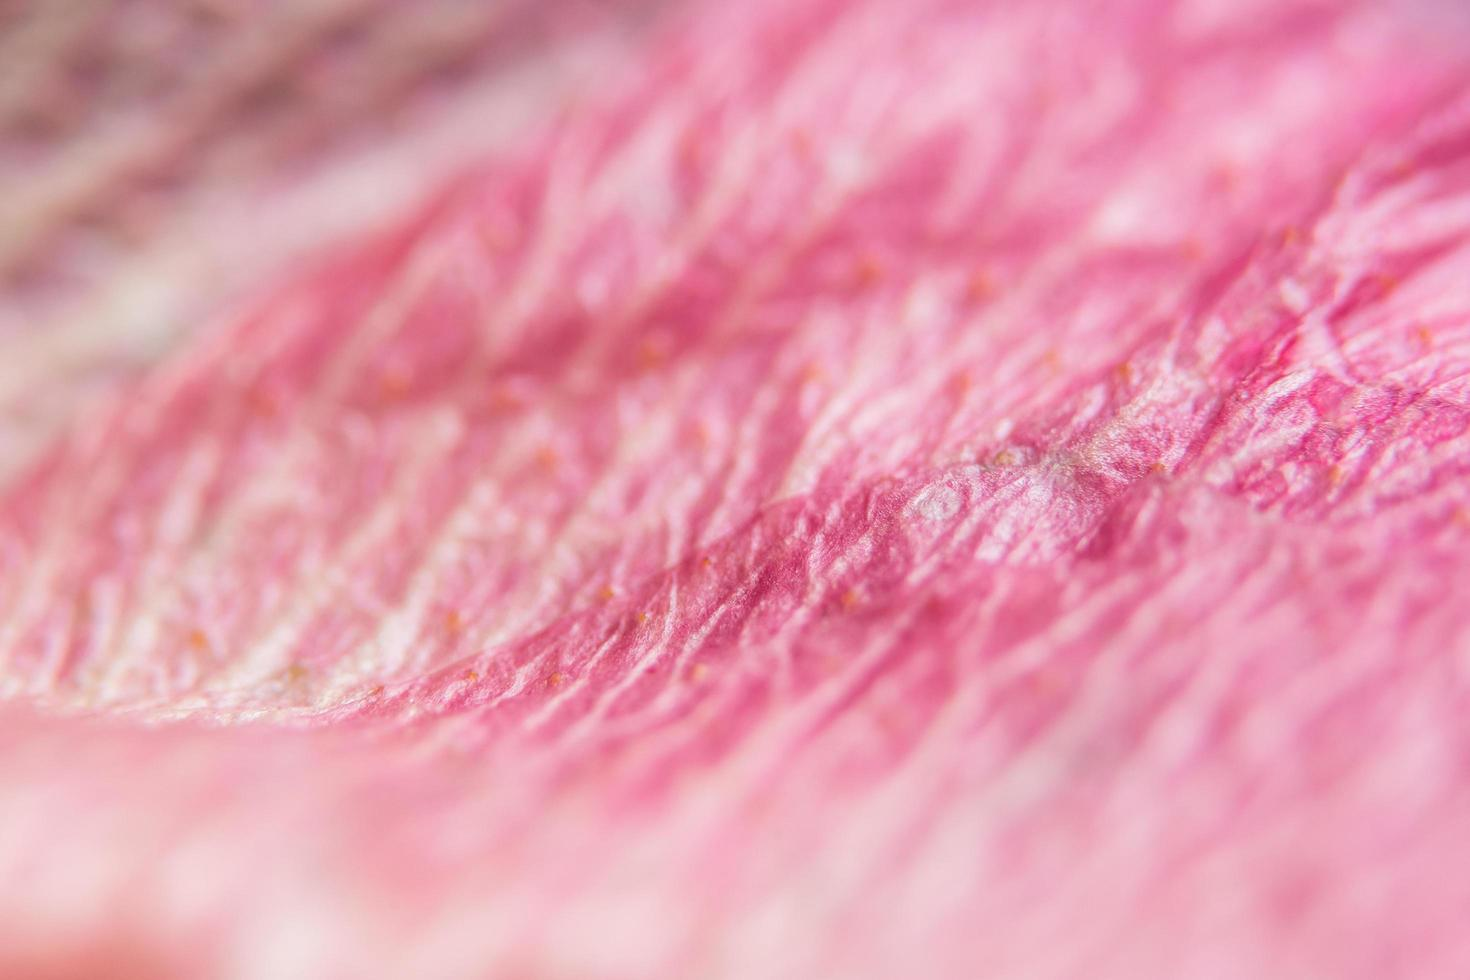 rosa Blütenblätter Nahaufnahme foto